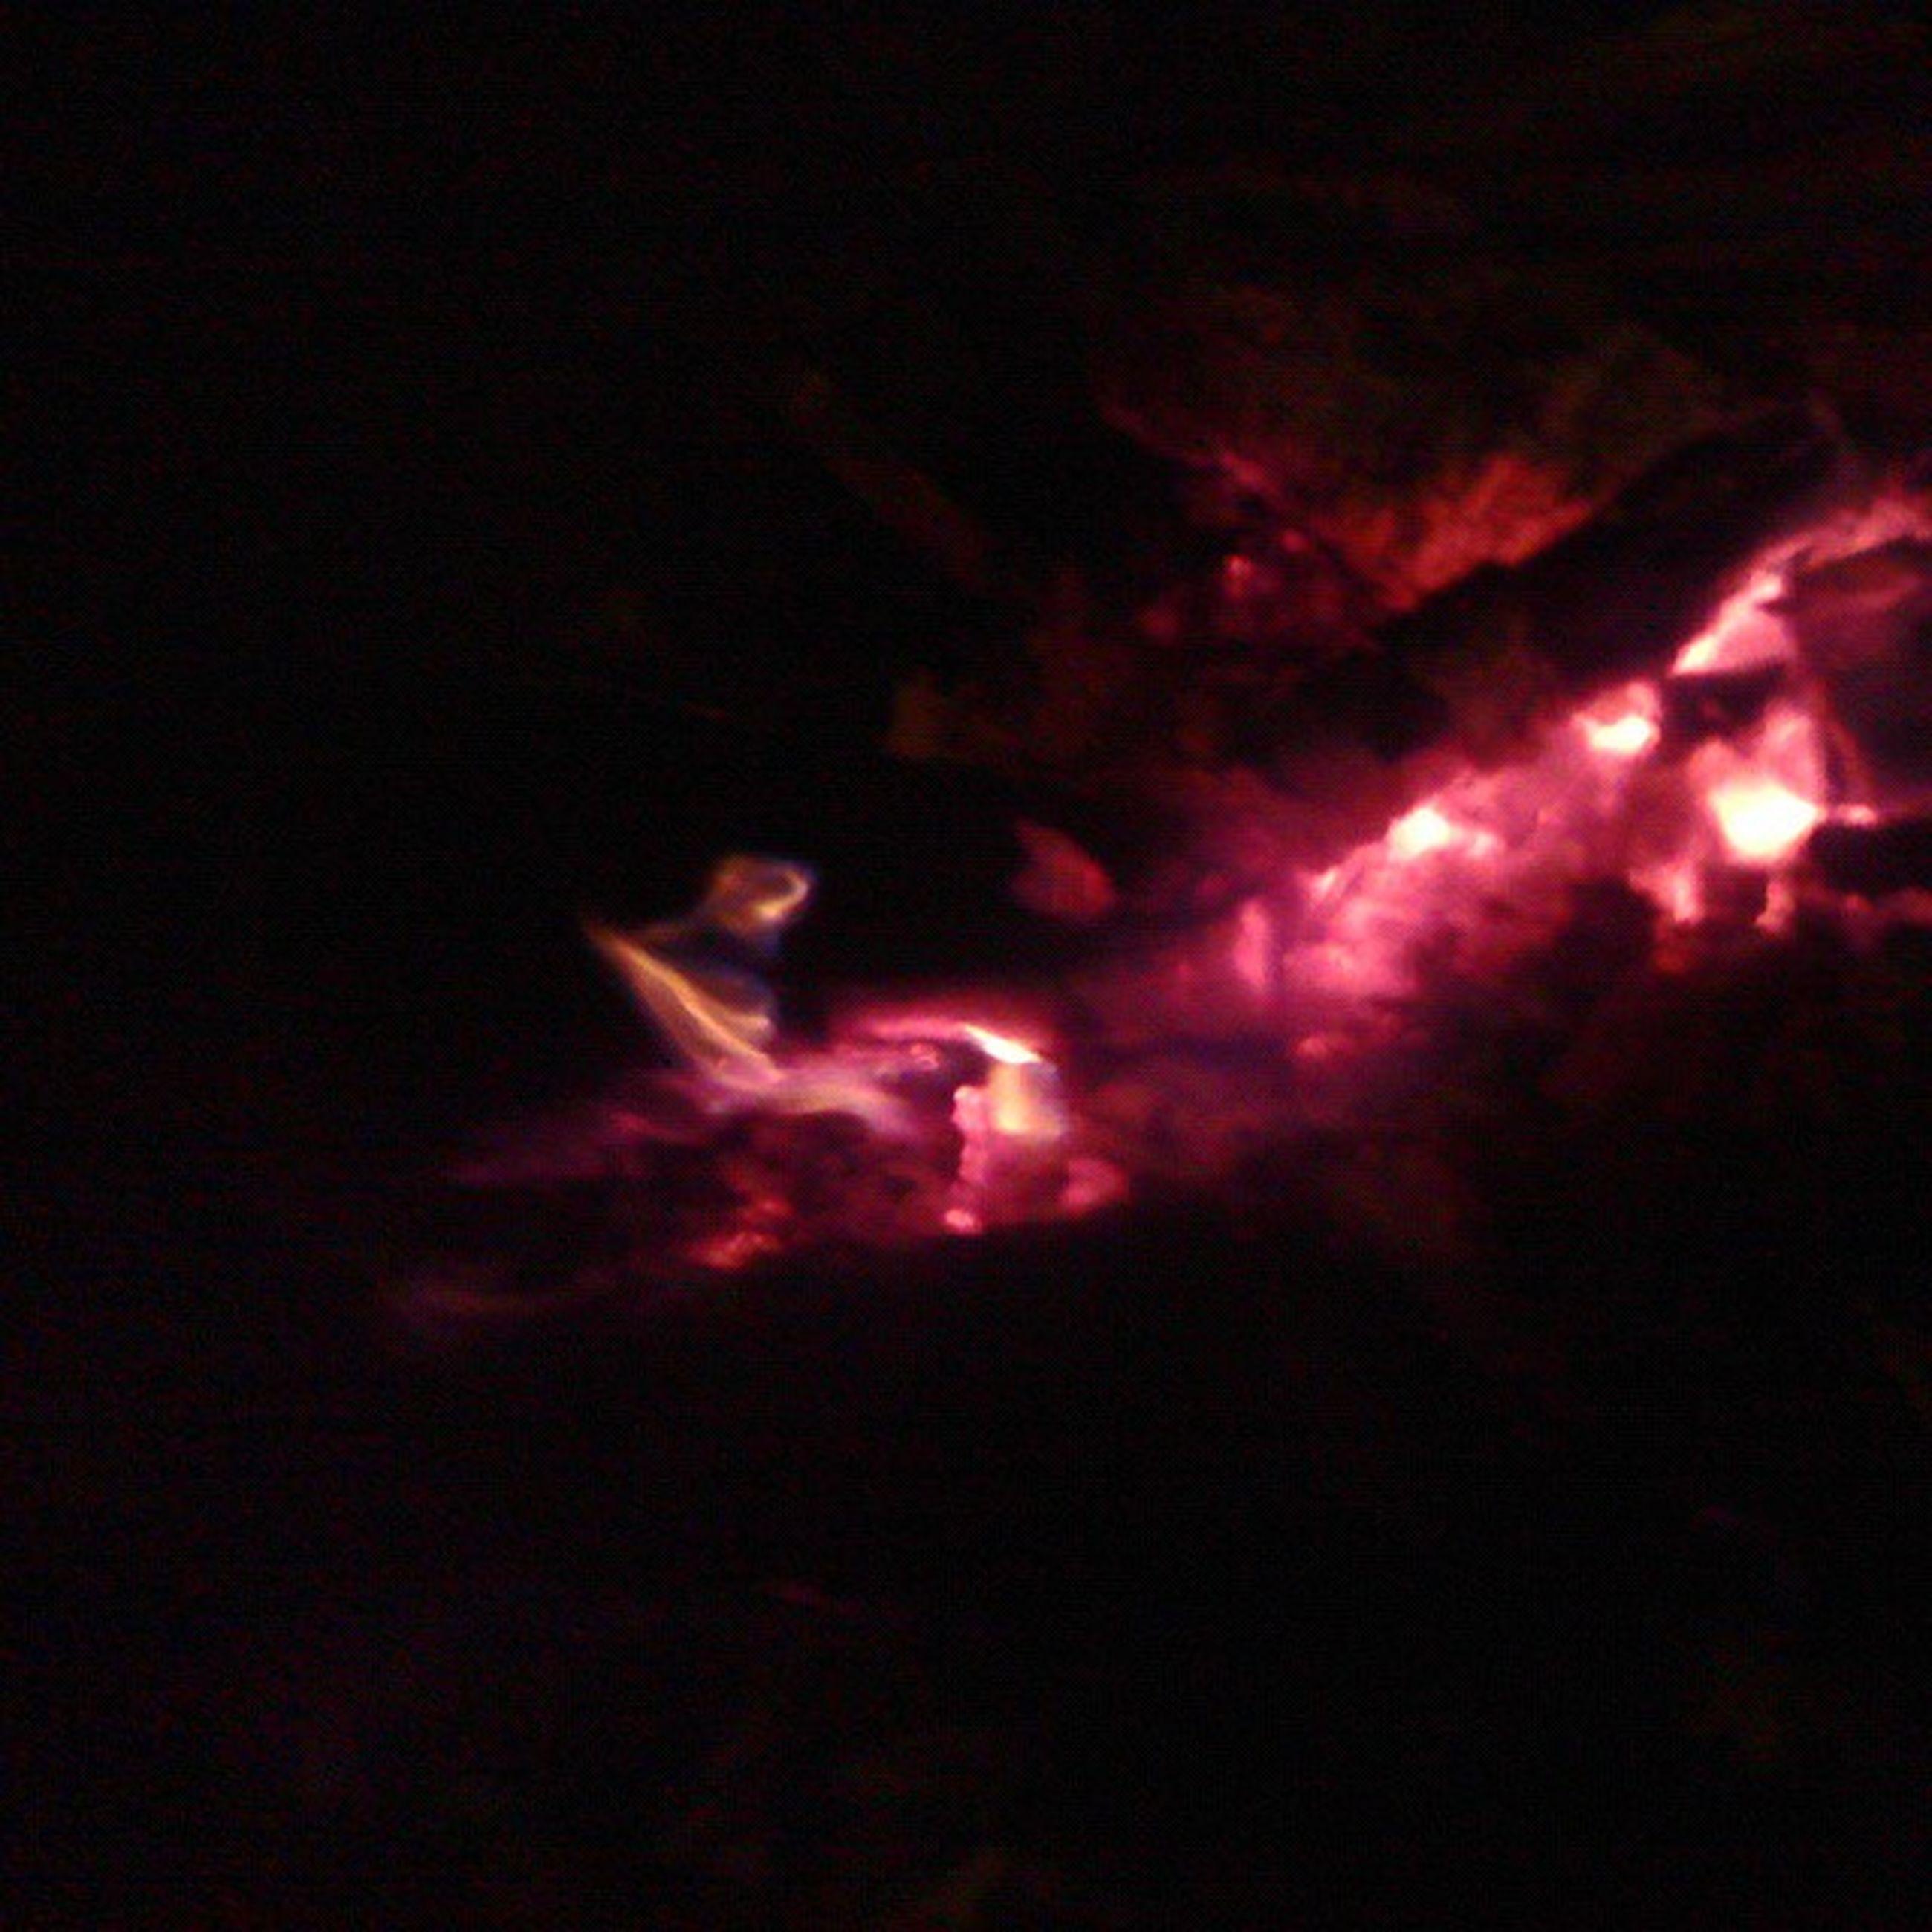 night, burning, flame, illuminated, dark, heat - temperature, fire - natural phenomenon, glowing, light - natural phenomenon, silhouette, danger, motion, performance, smoke - physical structure, skill, men, fire, orange color, indoors